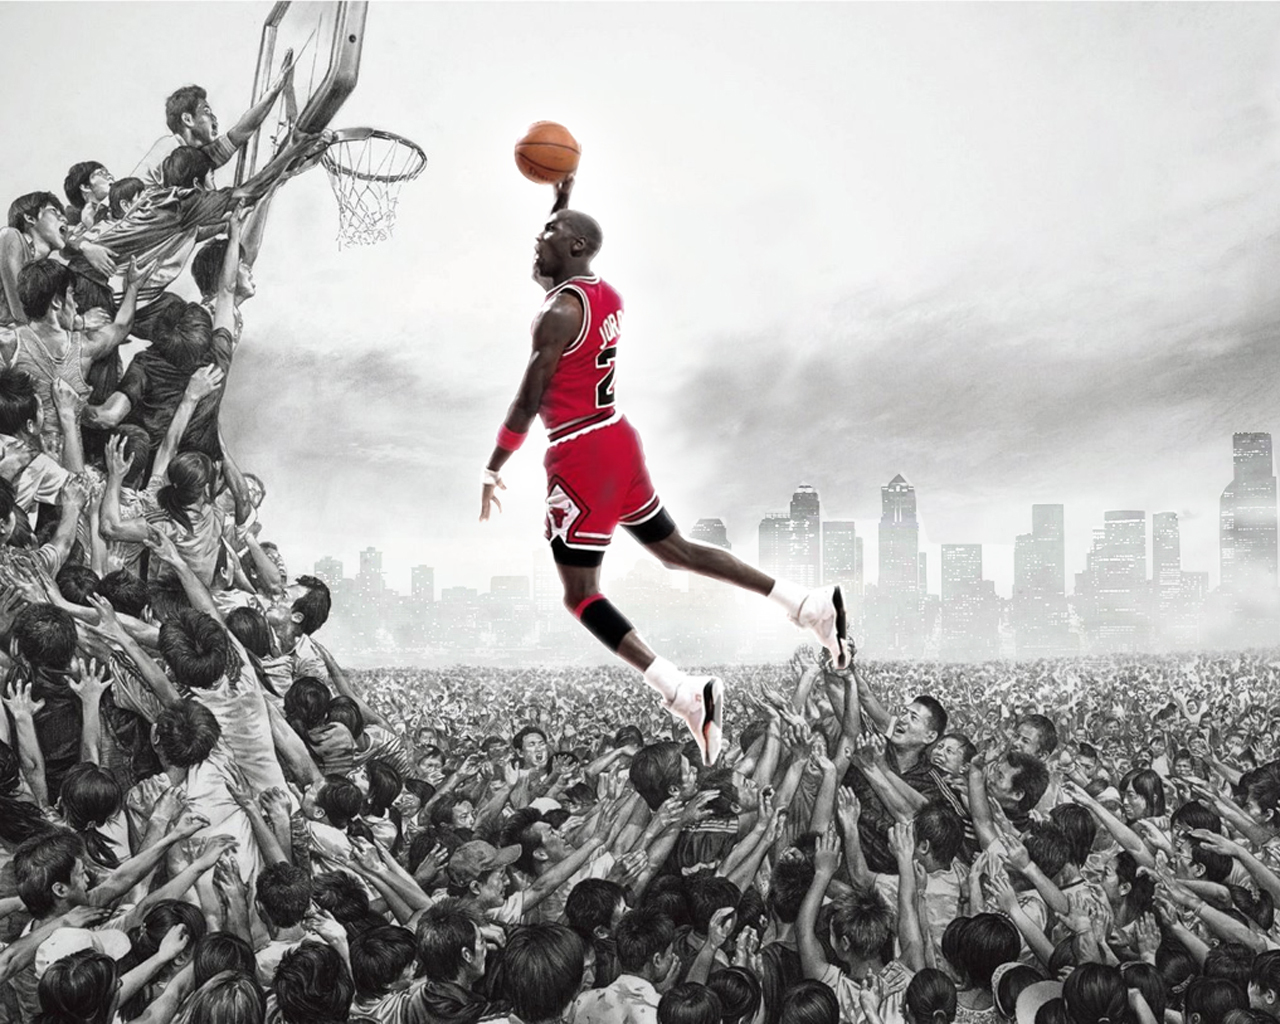 Michael Jordan Wallpaper 1280x1024